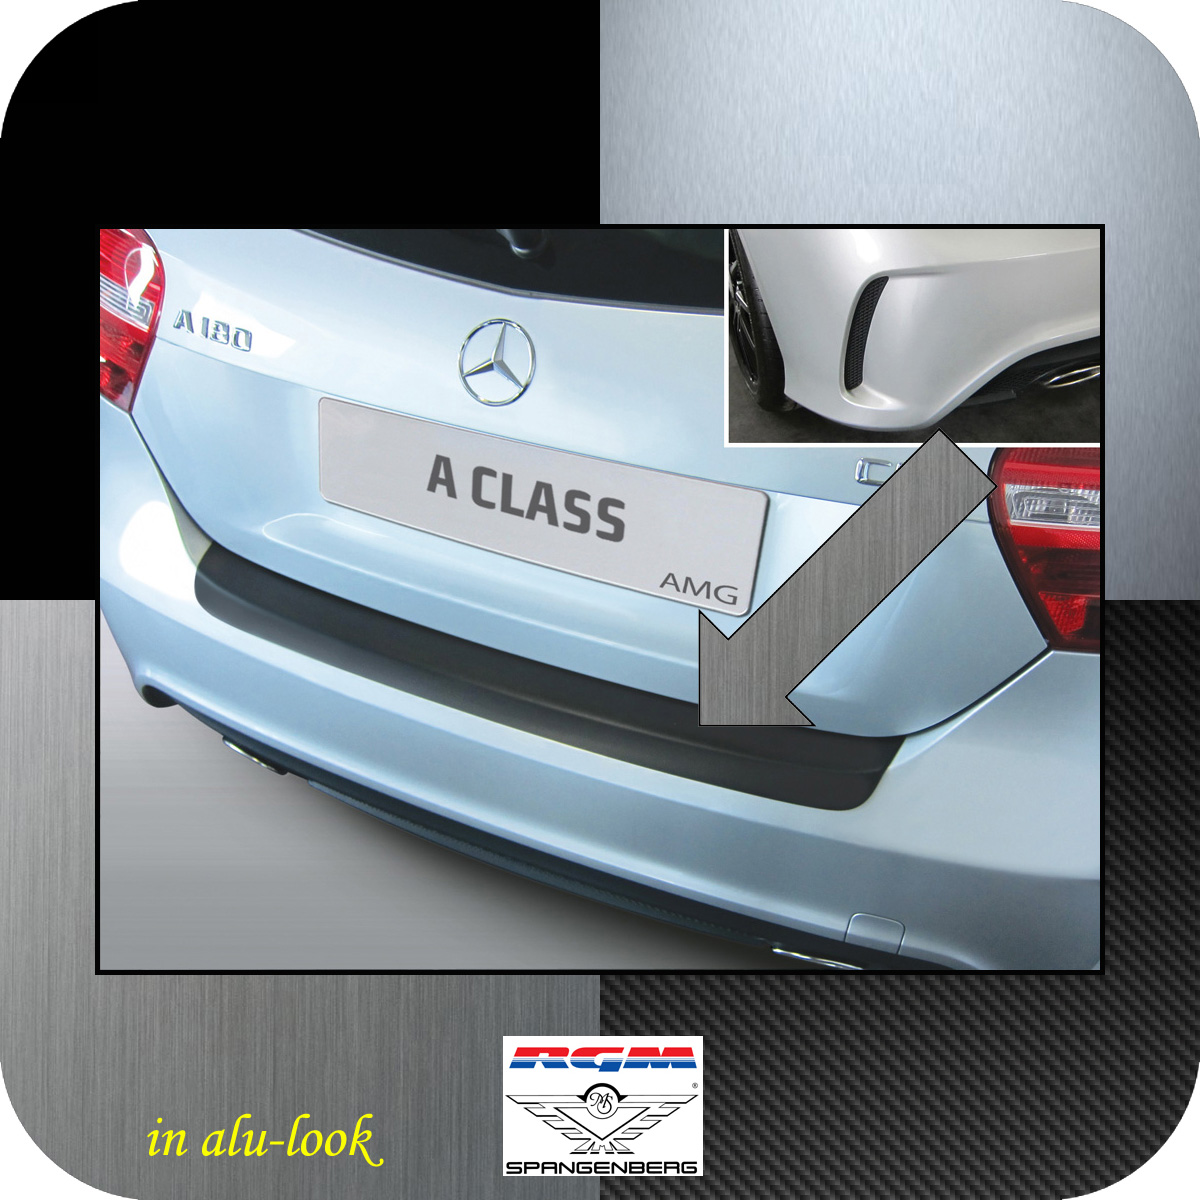 Ladekantenschutz Alu-look Mercedes A-Klasse W176 2012- nur 45 AMG & 250 3504951